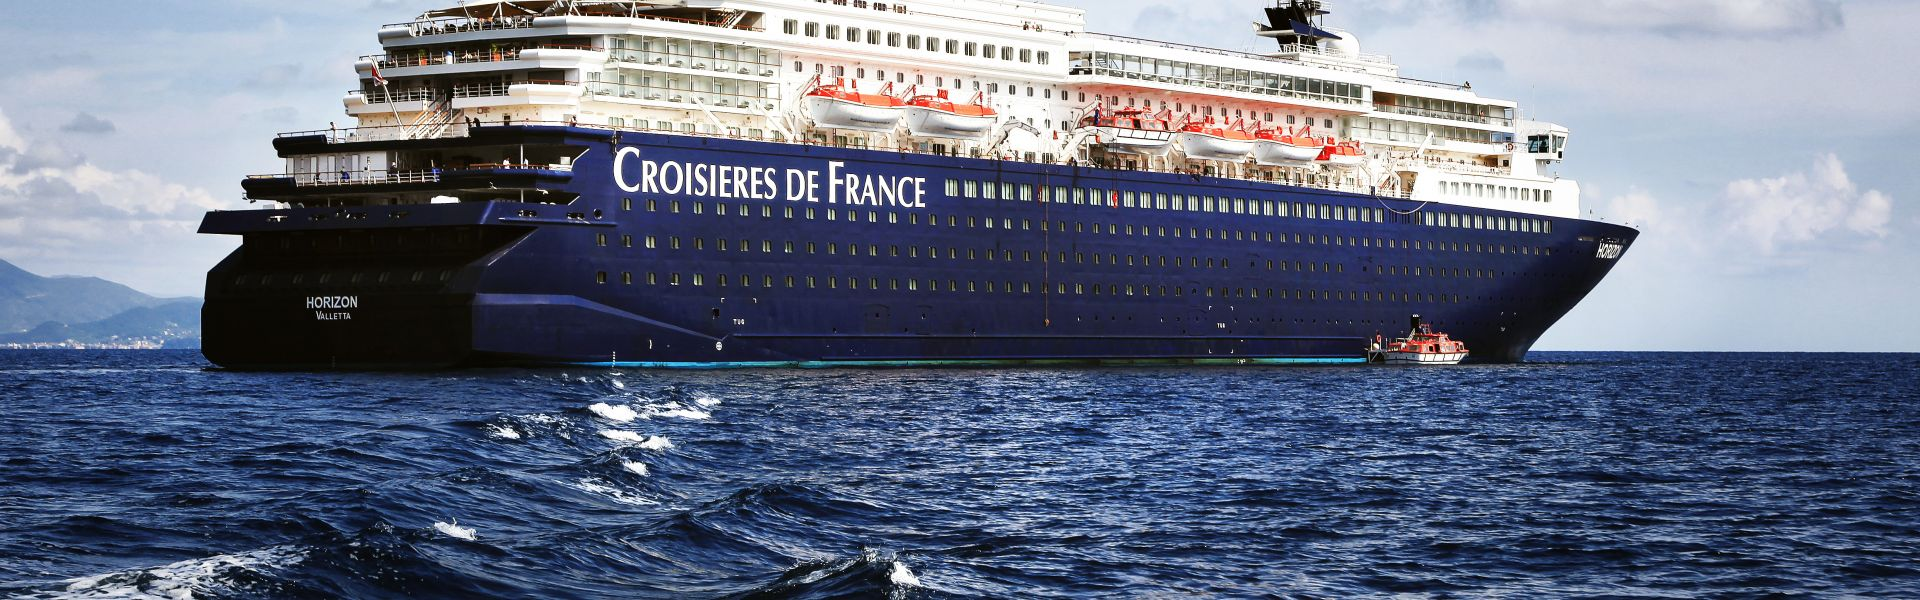 Croaziera - Insulele Canare (Lanzarote) - Pullmantur Cruises - Horizon - 7 nopti